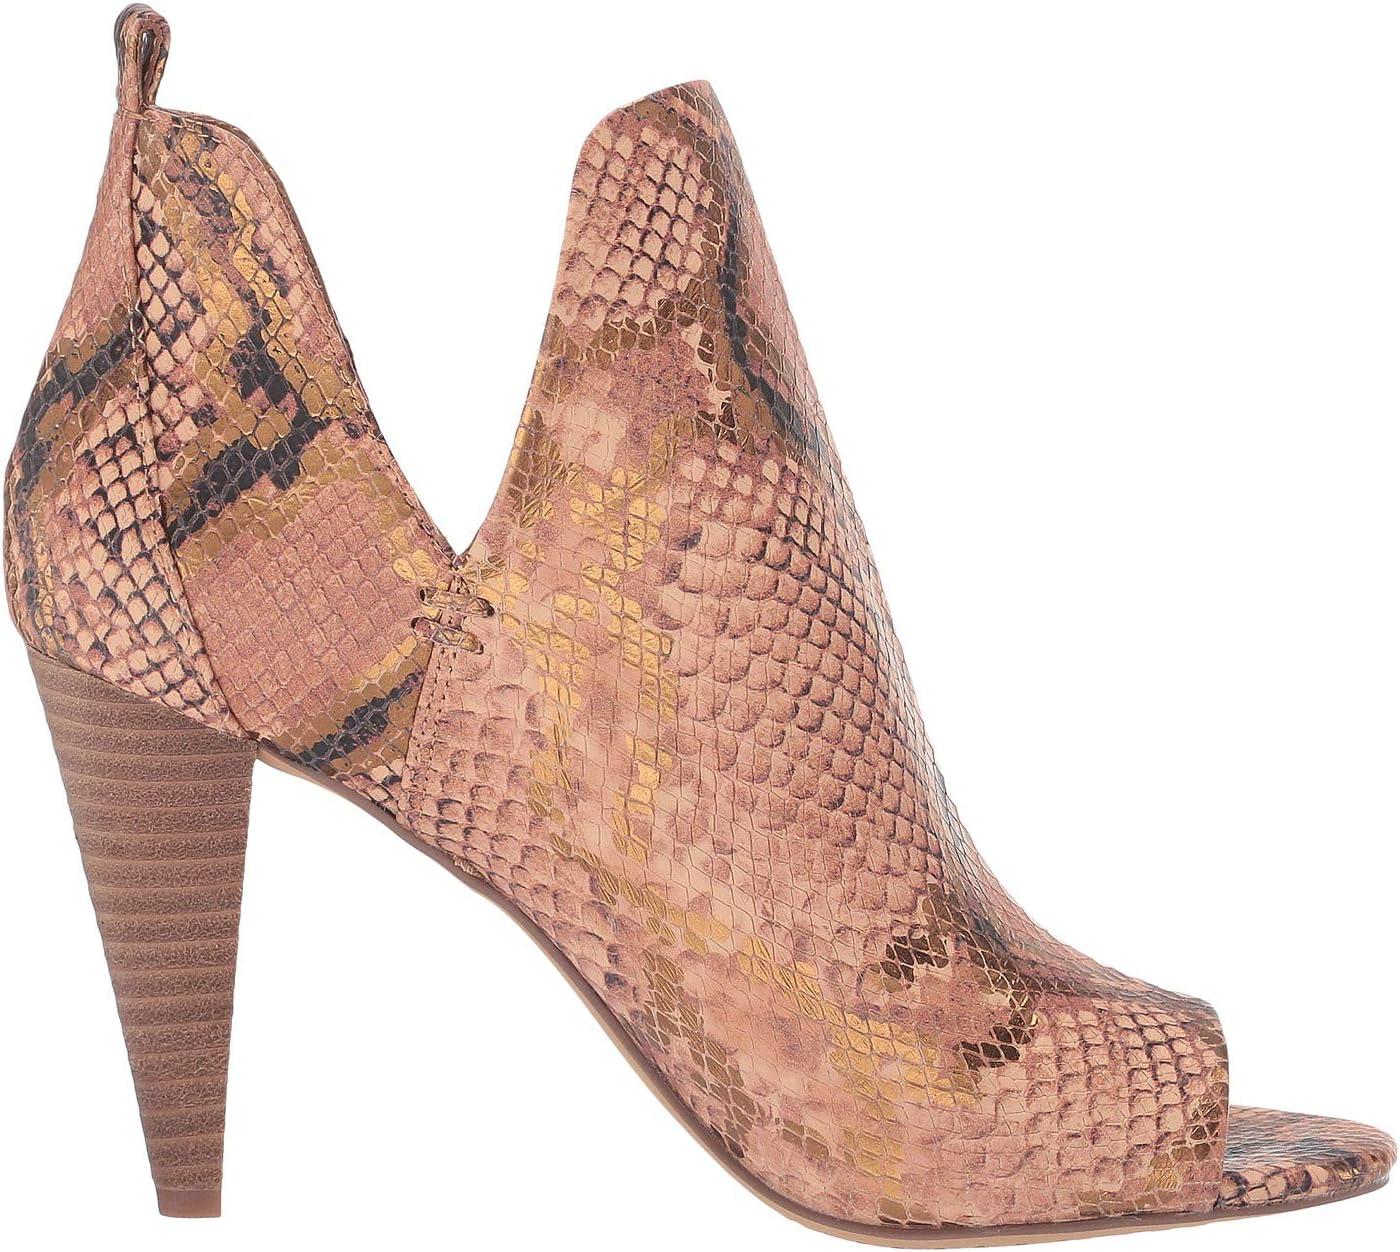 Vince Camuto Allanna | Women's shoes | 2020 Newest